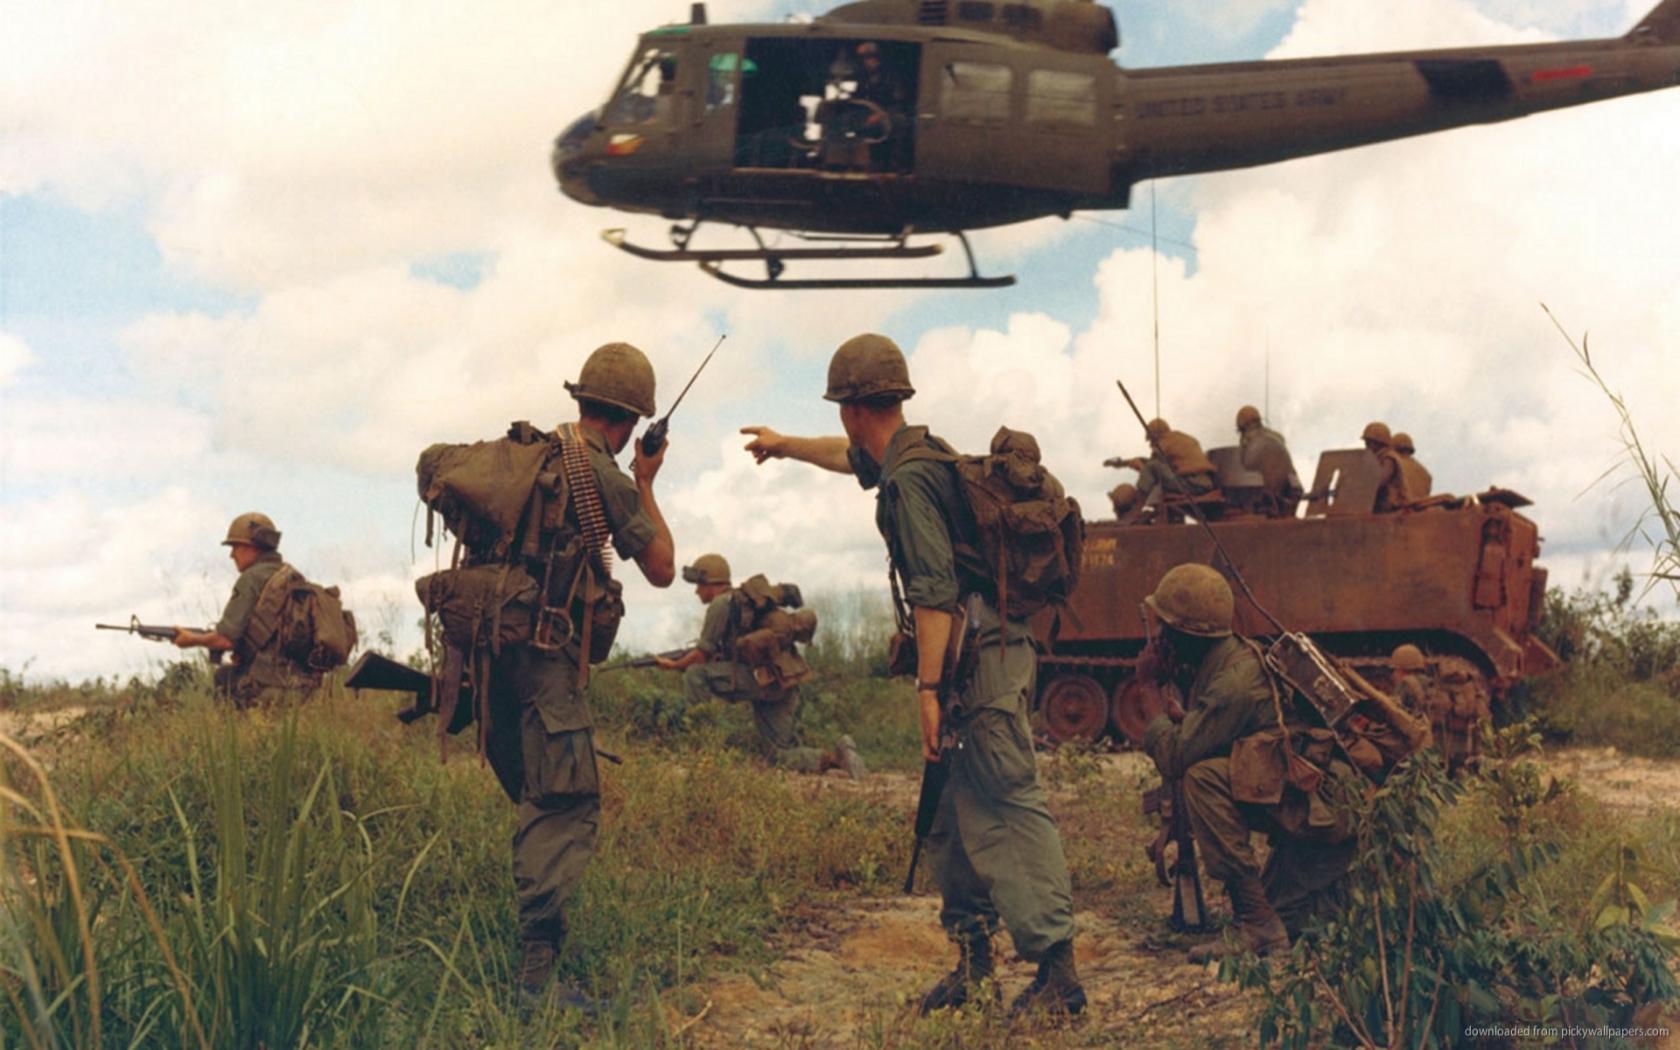 Vietnam War Wallpapers Full HD 86S53W7   4USkY 1680x1050